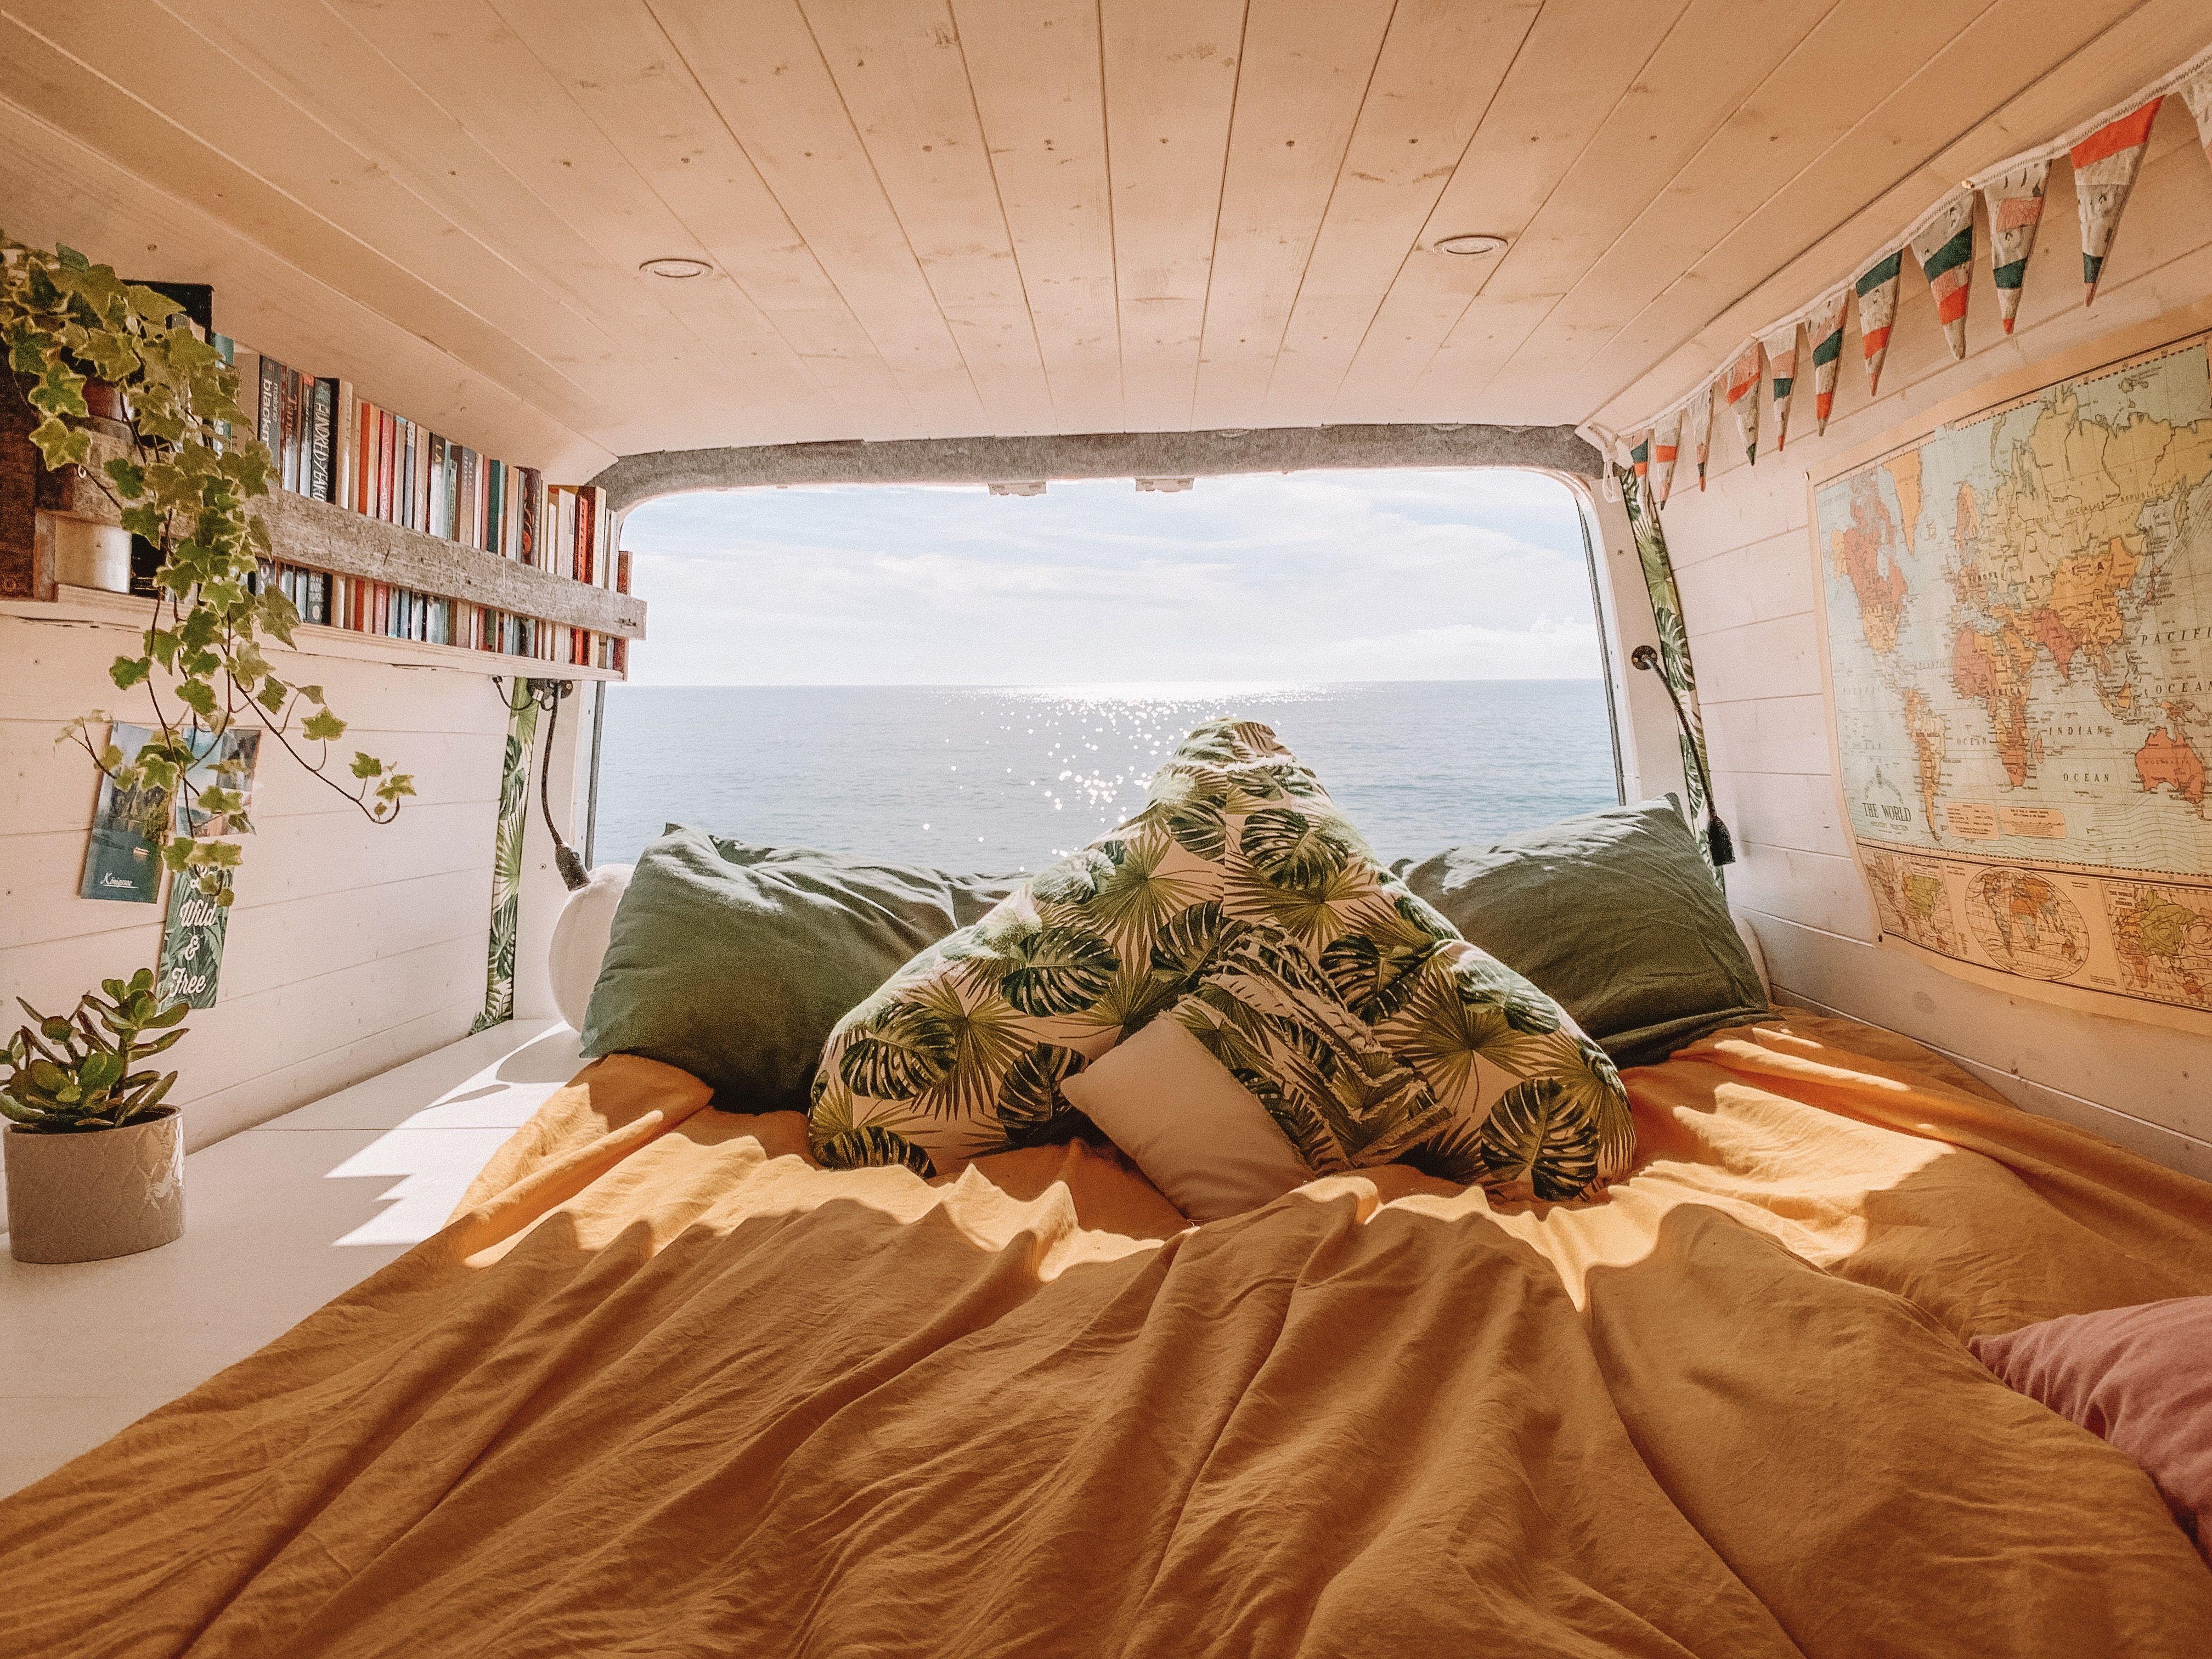 Photo of Van Life Interior | Van life aesthetic | Van life ideas